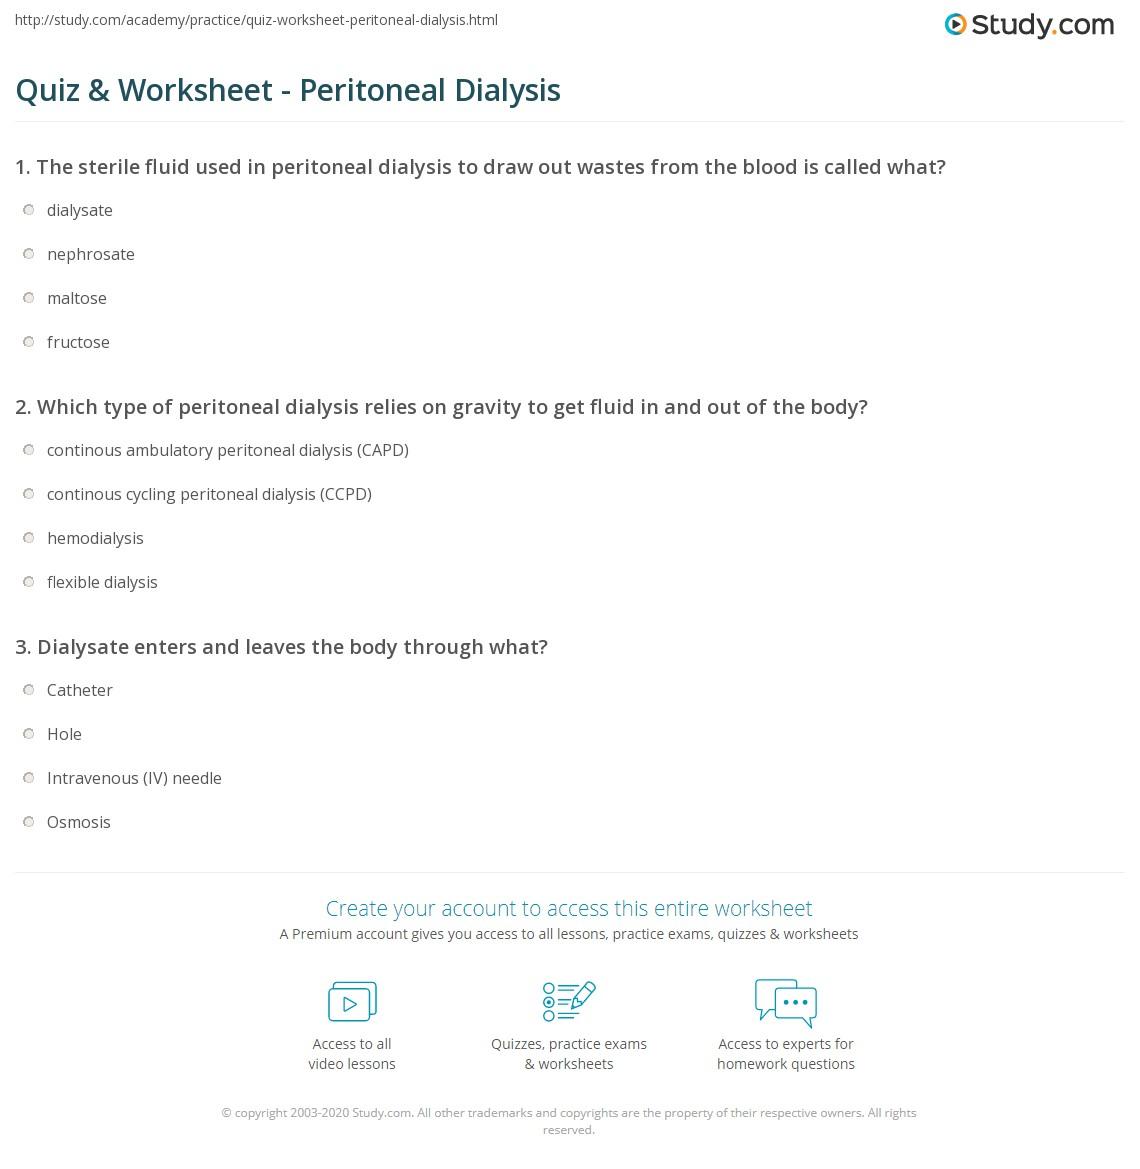 Quiz & Worksheet - Peritoneal Dialysis   Study com